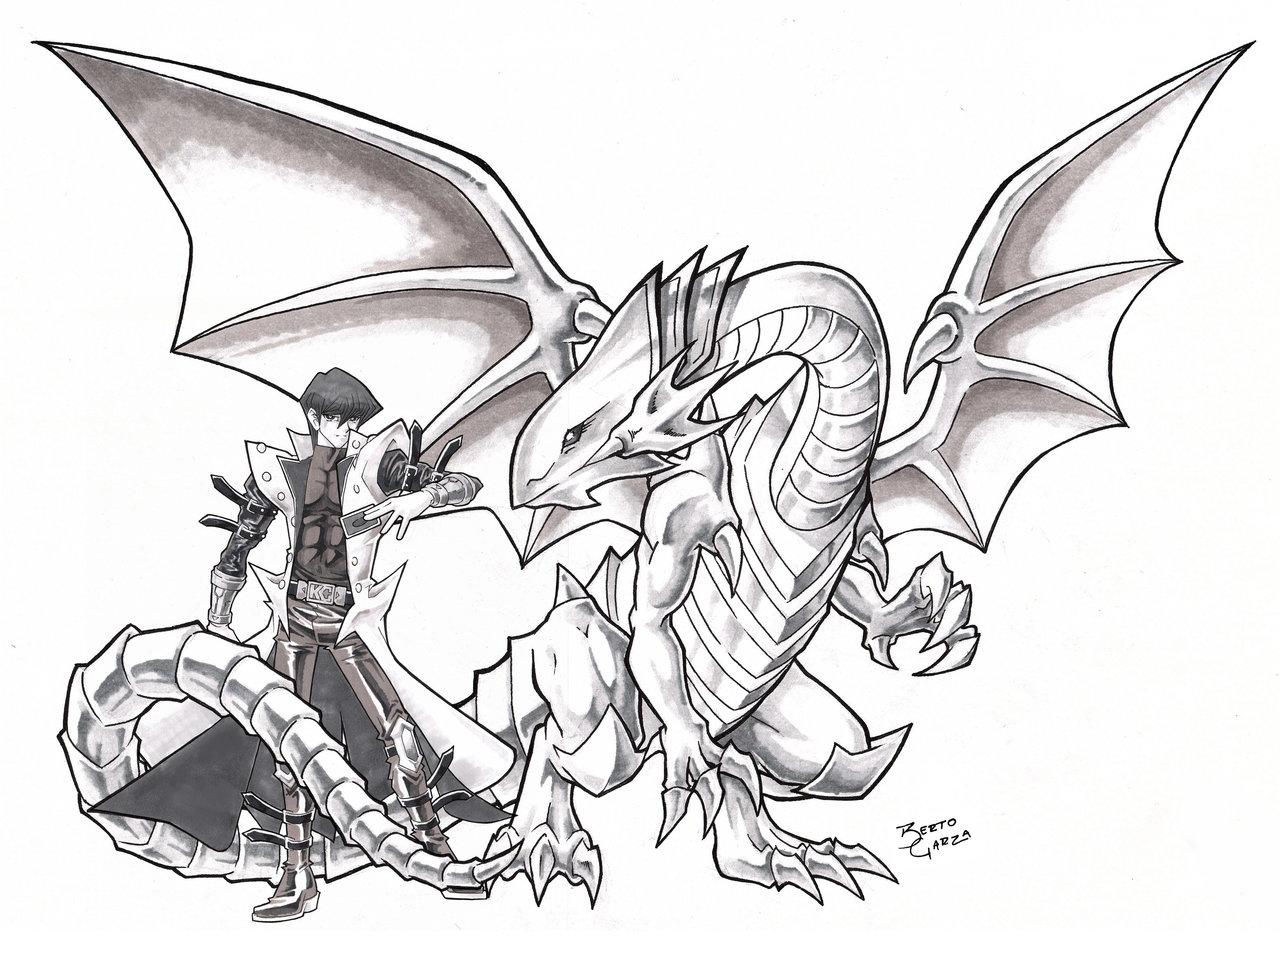 1280x967 Kaiba And Blue Eyes White Dragon By Riomak